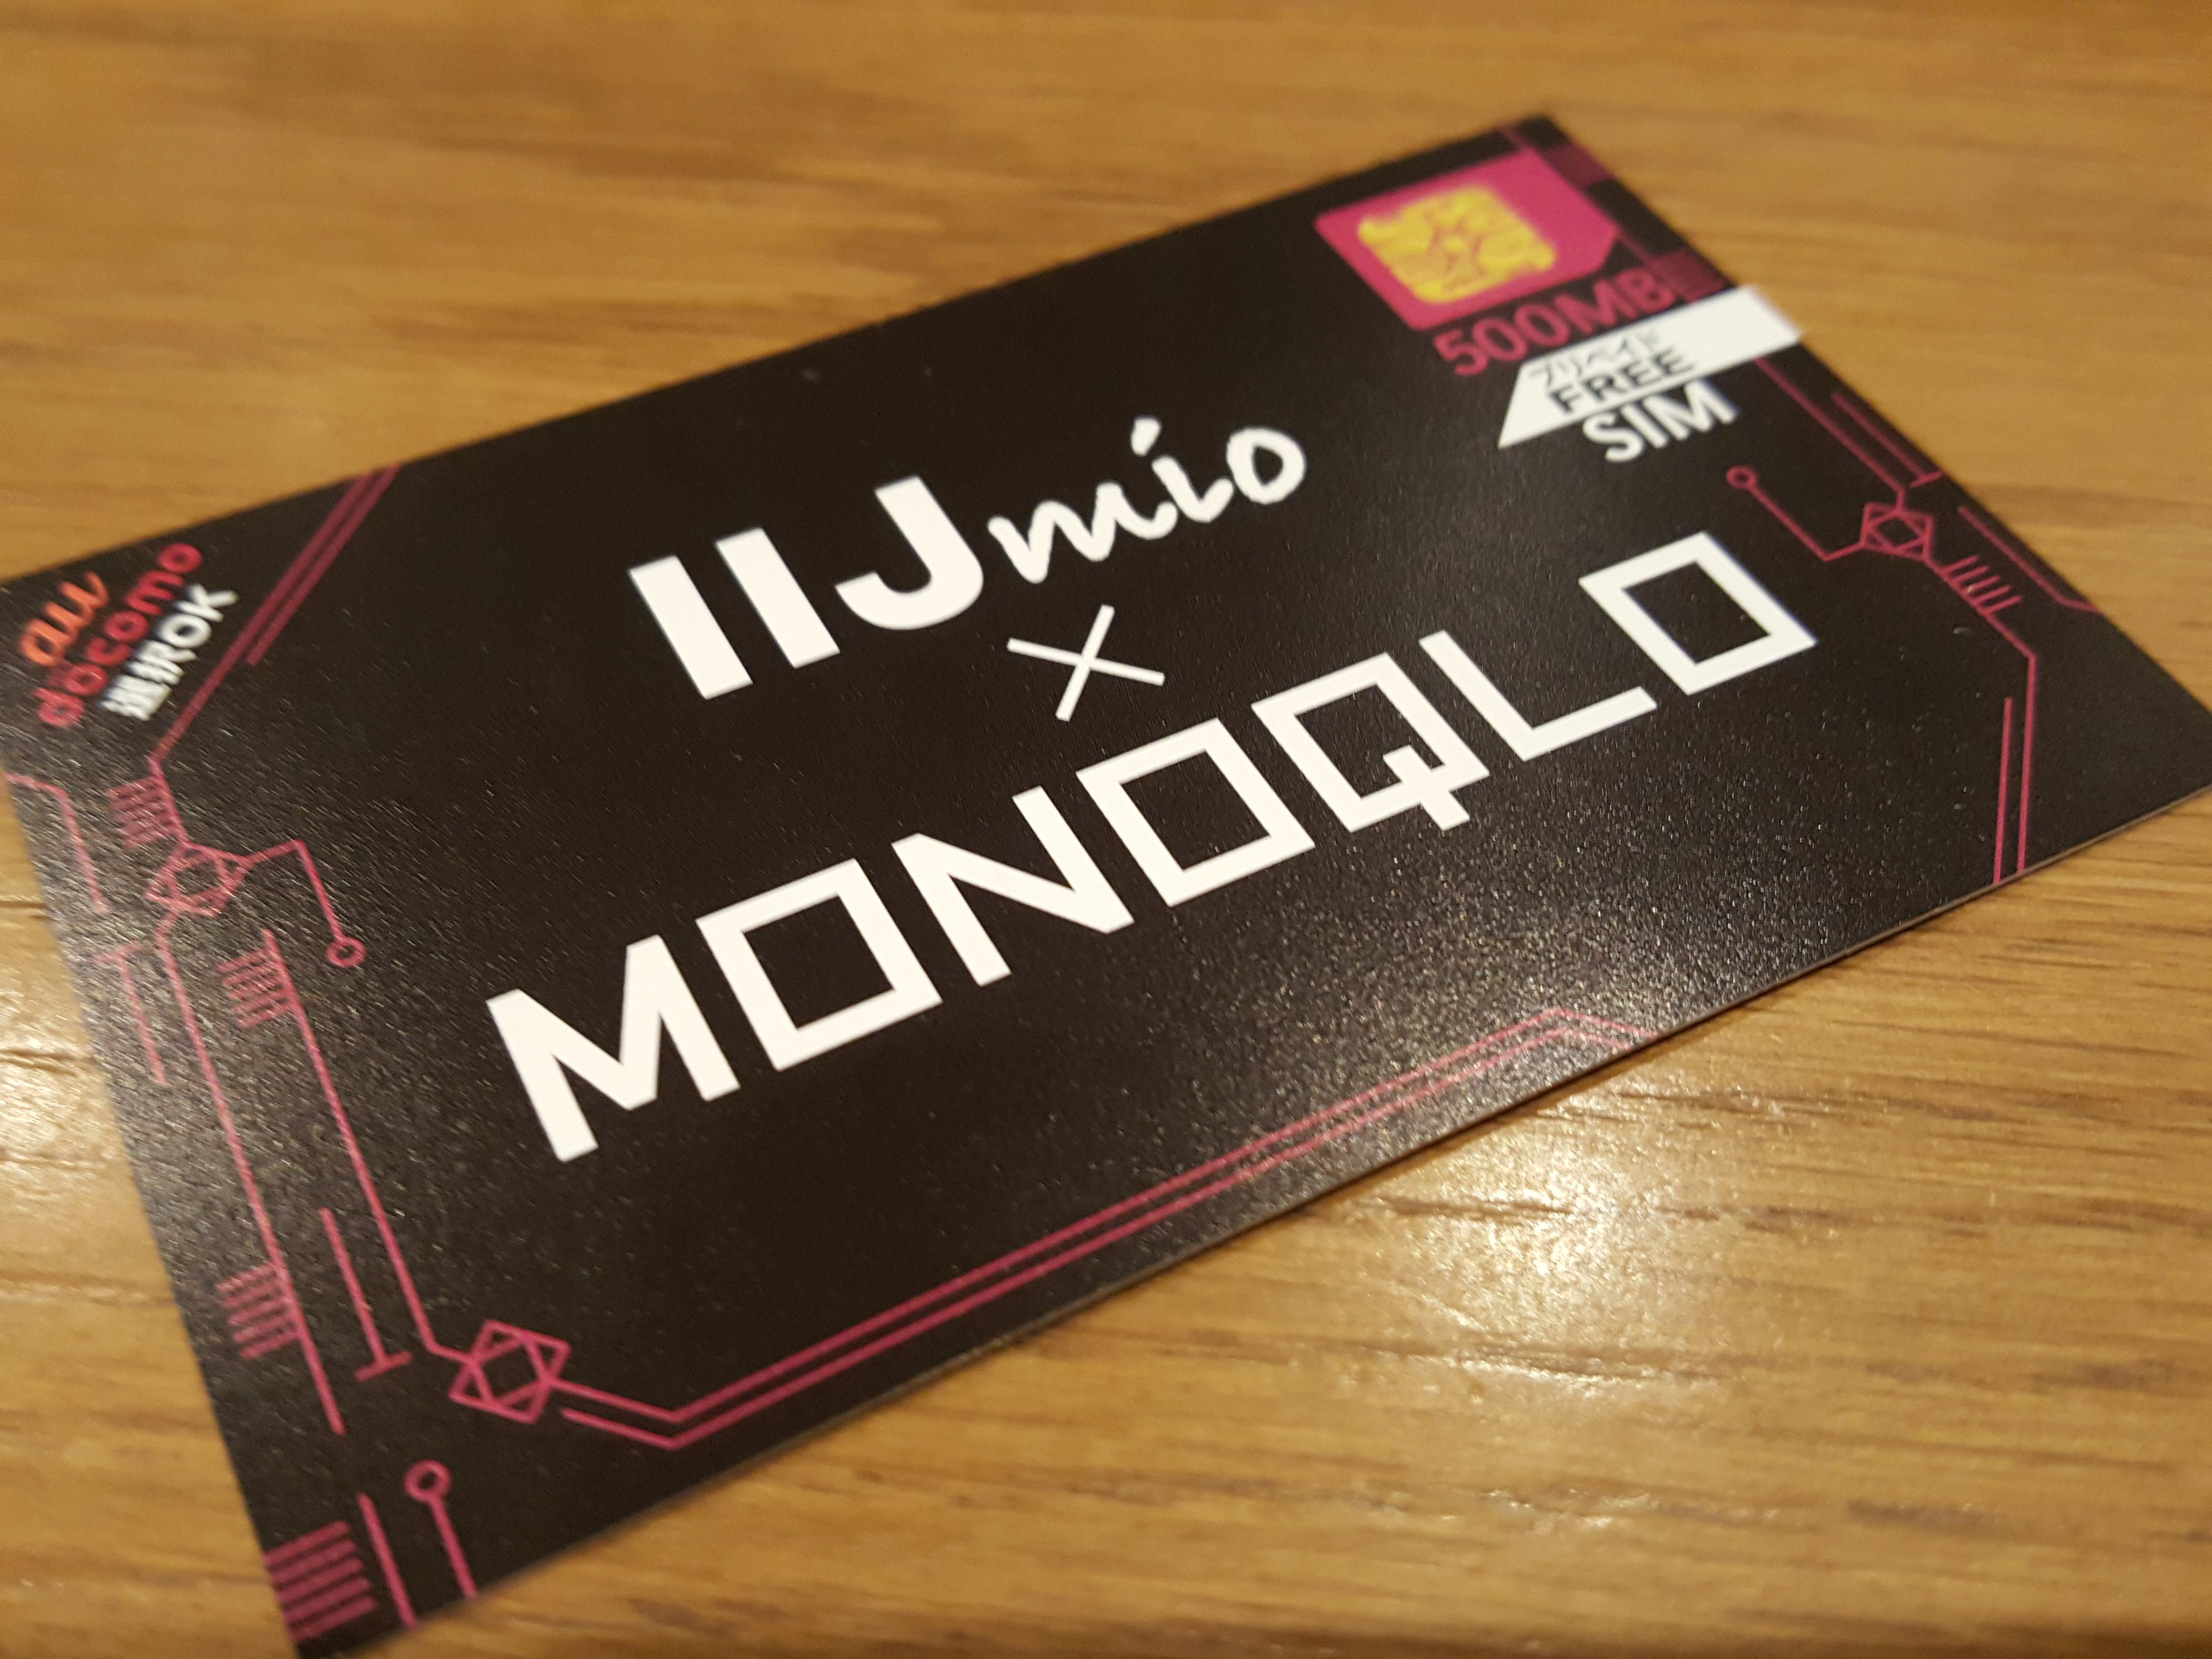 monoqlo_iijmio_201610_7